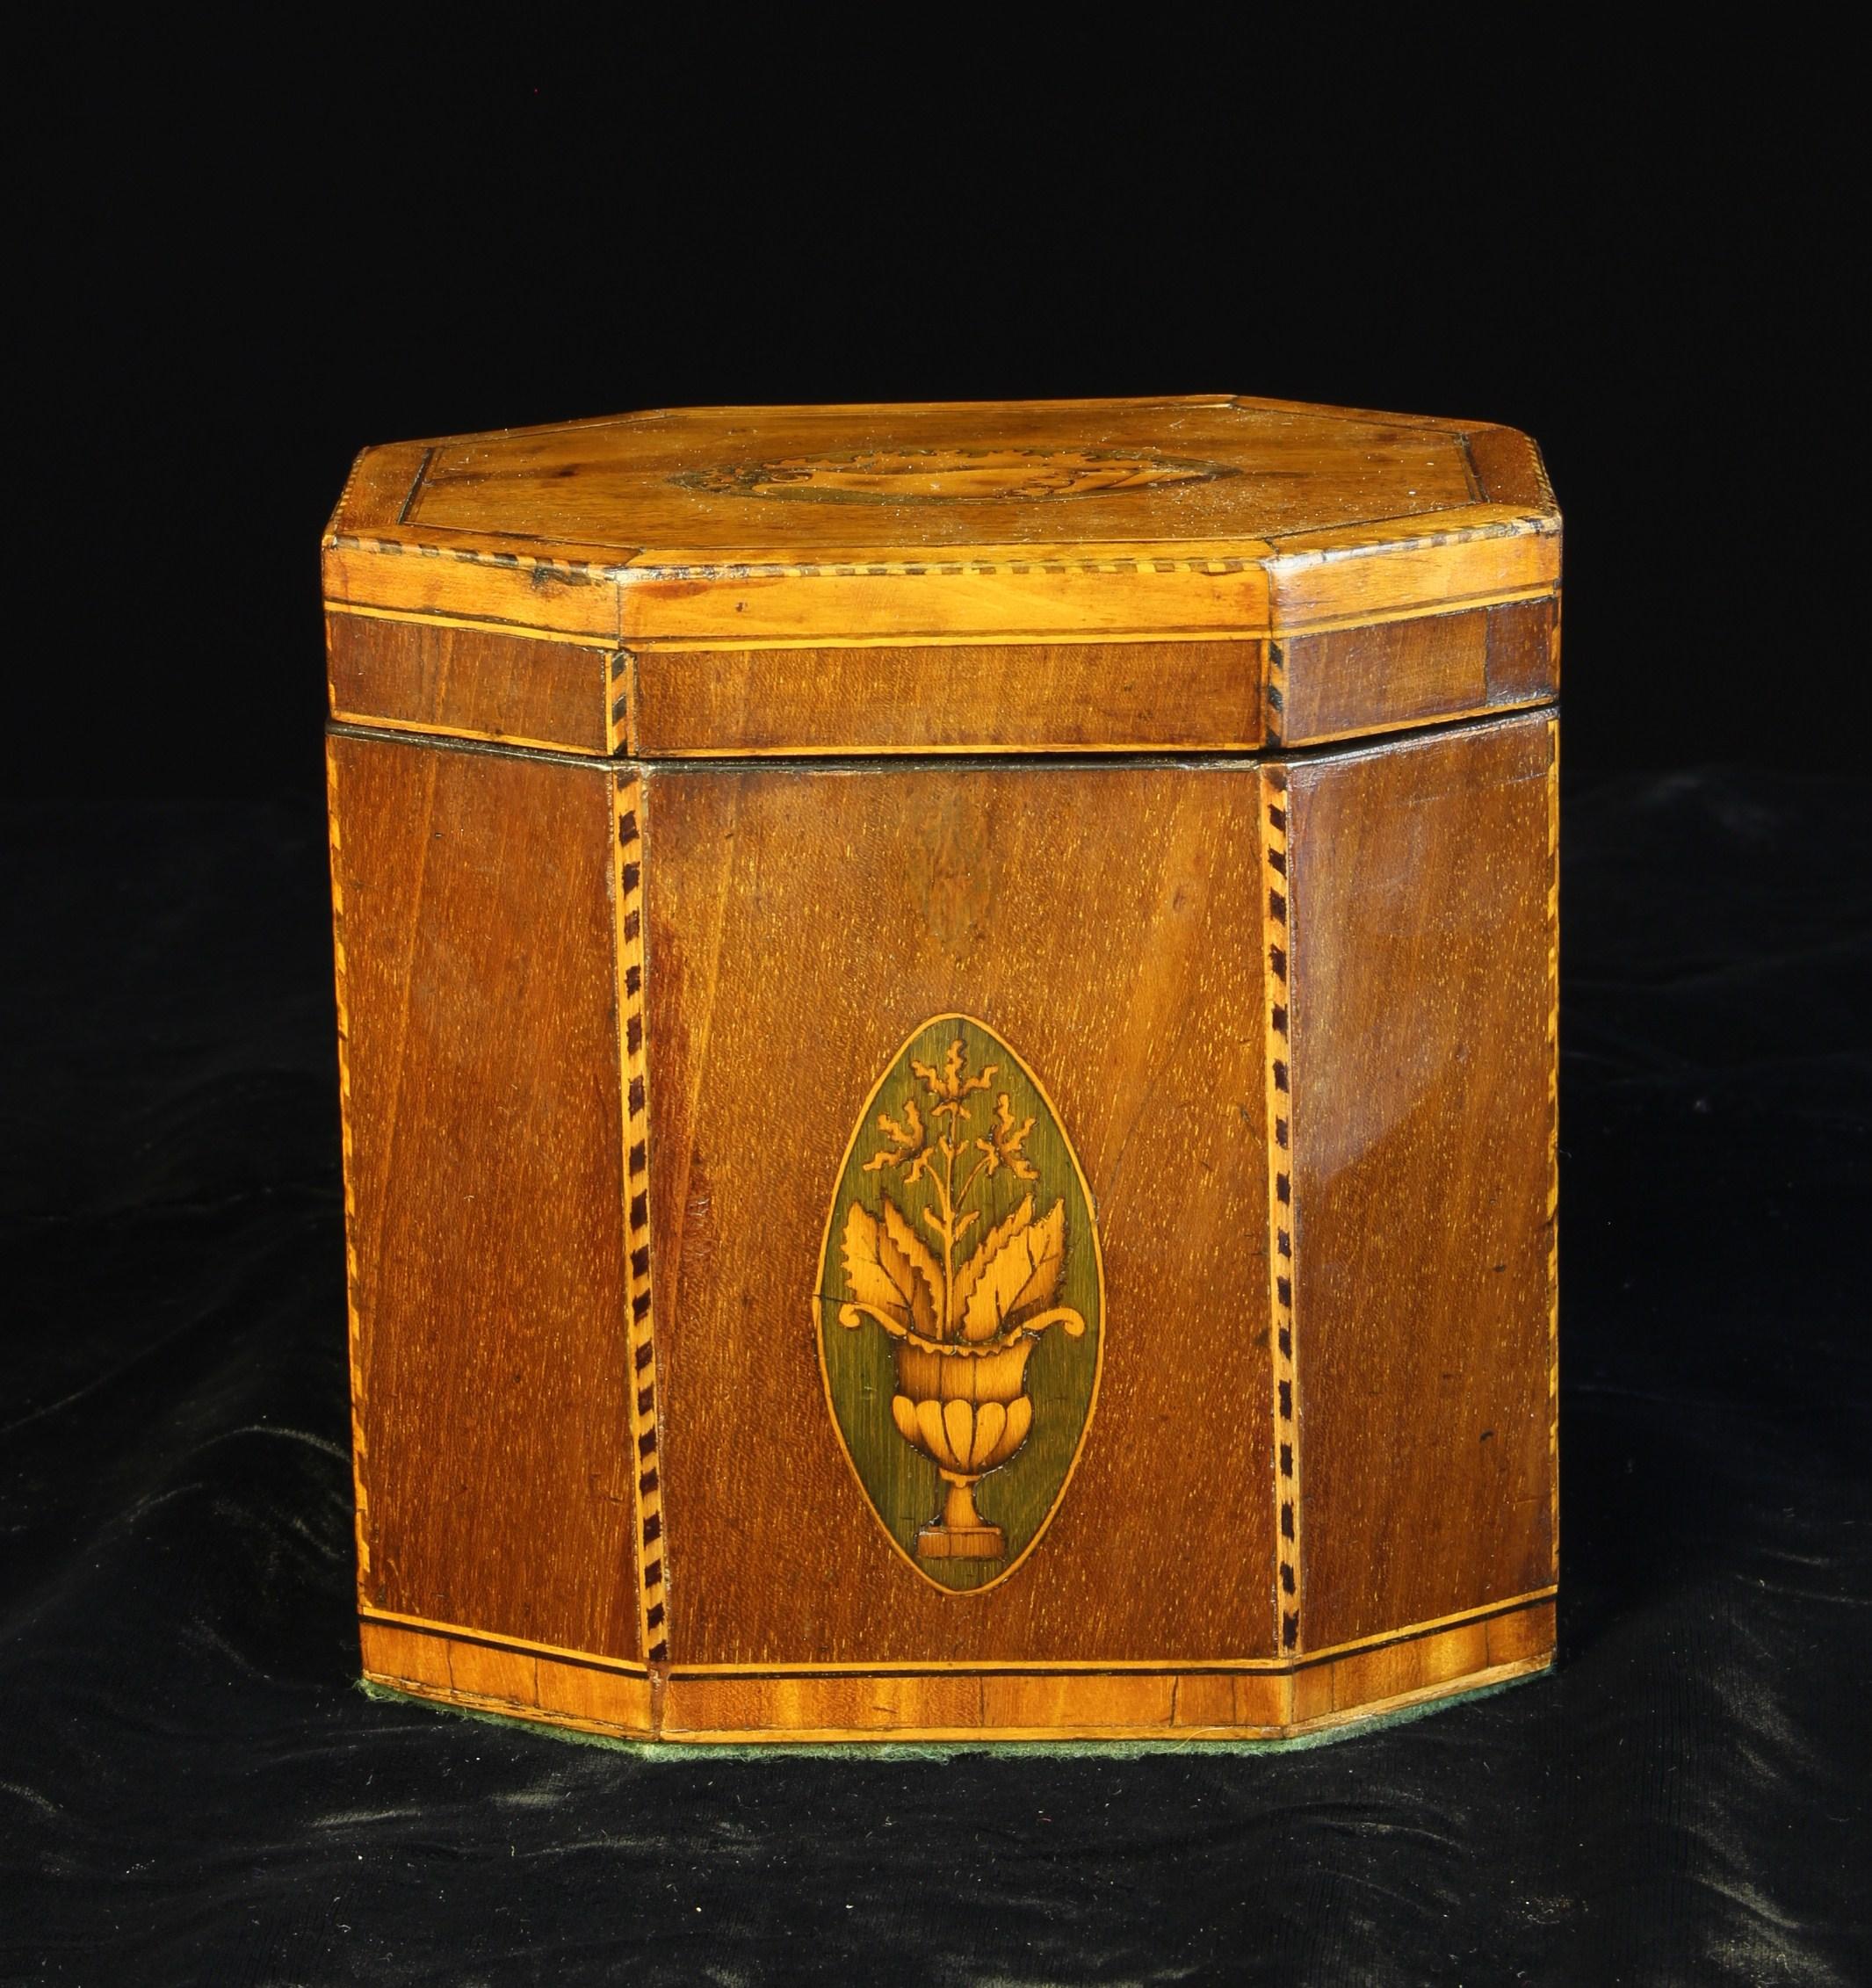 A George III Mahogany & Satinwood-banded Tea Caddy of octagonal form. - Image 2 of 3